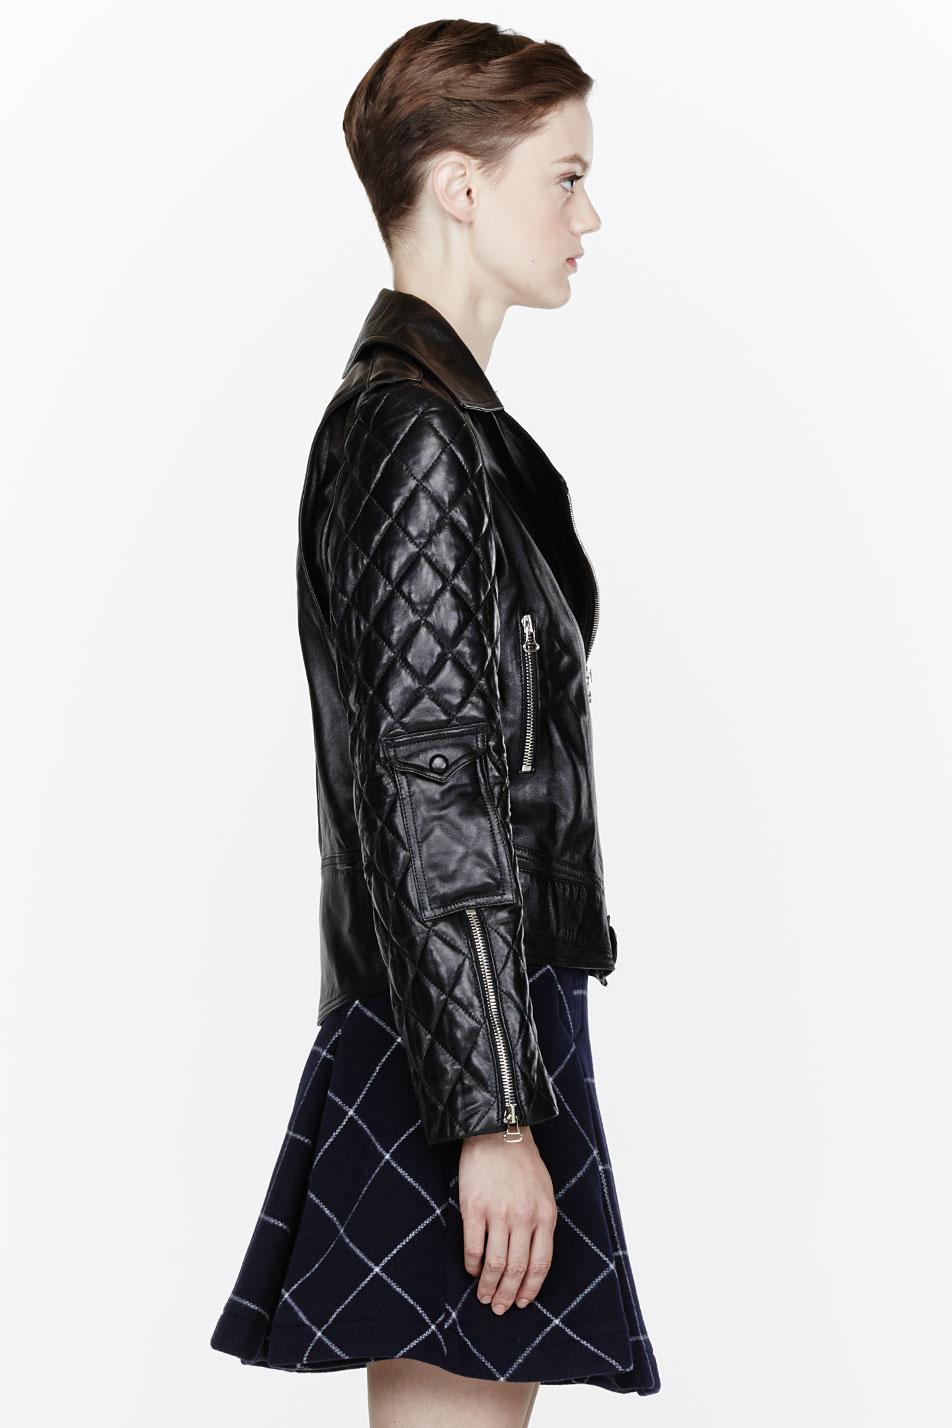 J.w.anderson Black Leather Quilted Biker Jacket in Black